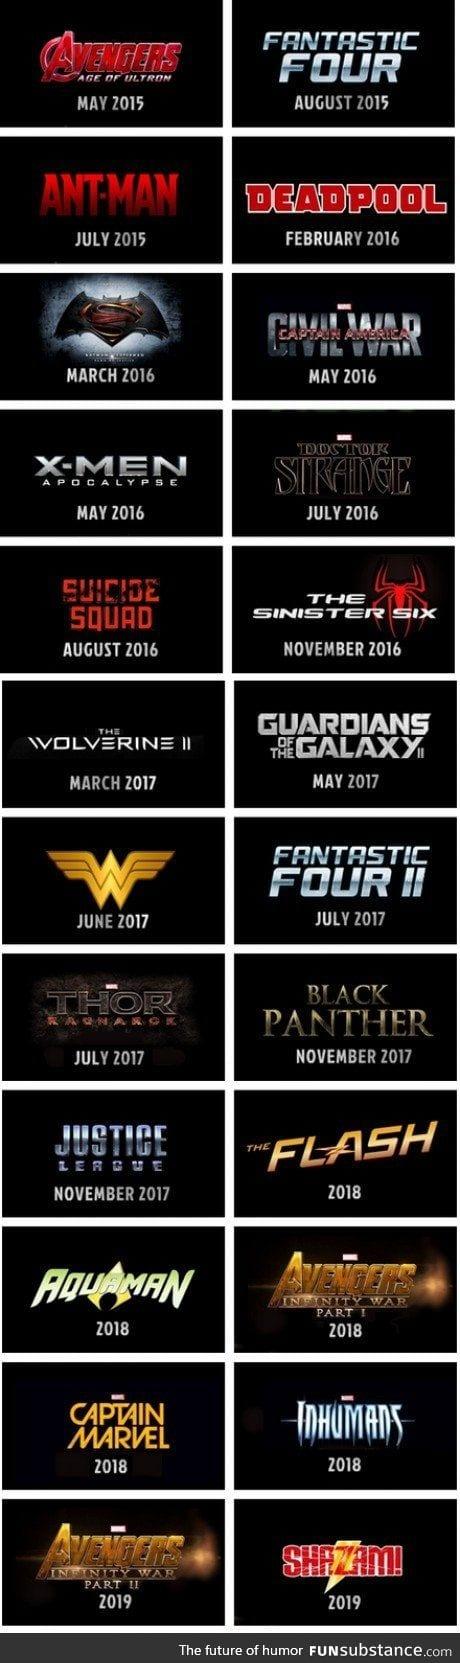 Marvel, DC, Fox, Sony...The full superhero movie lineup